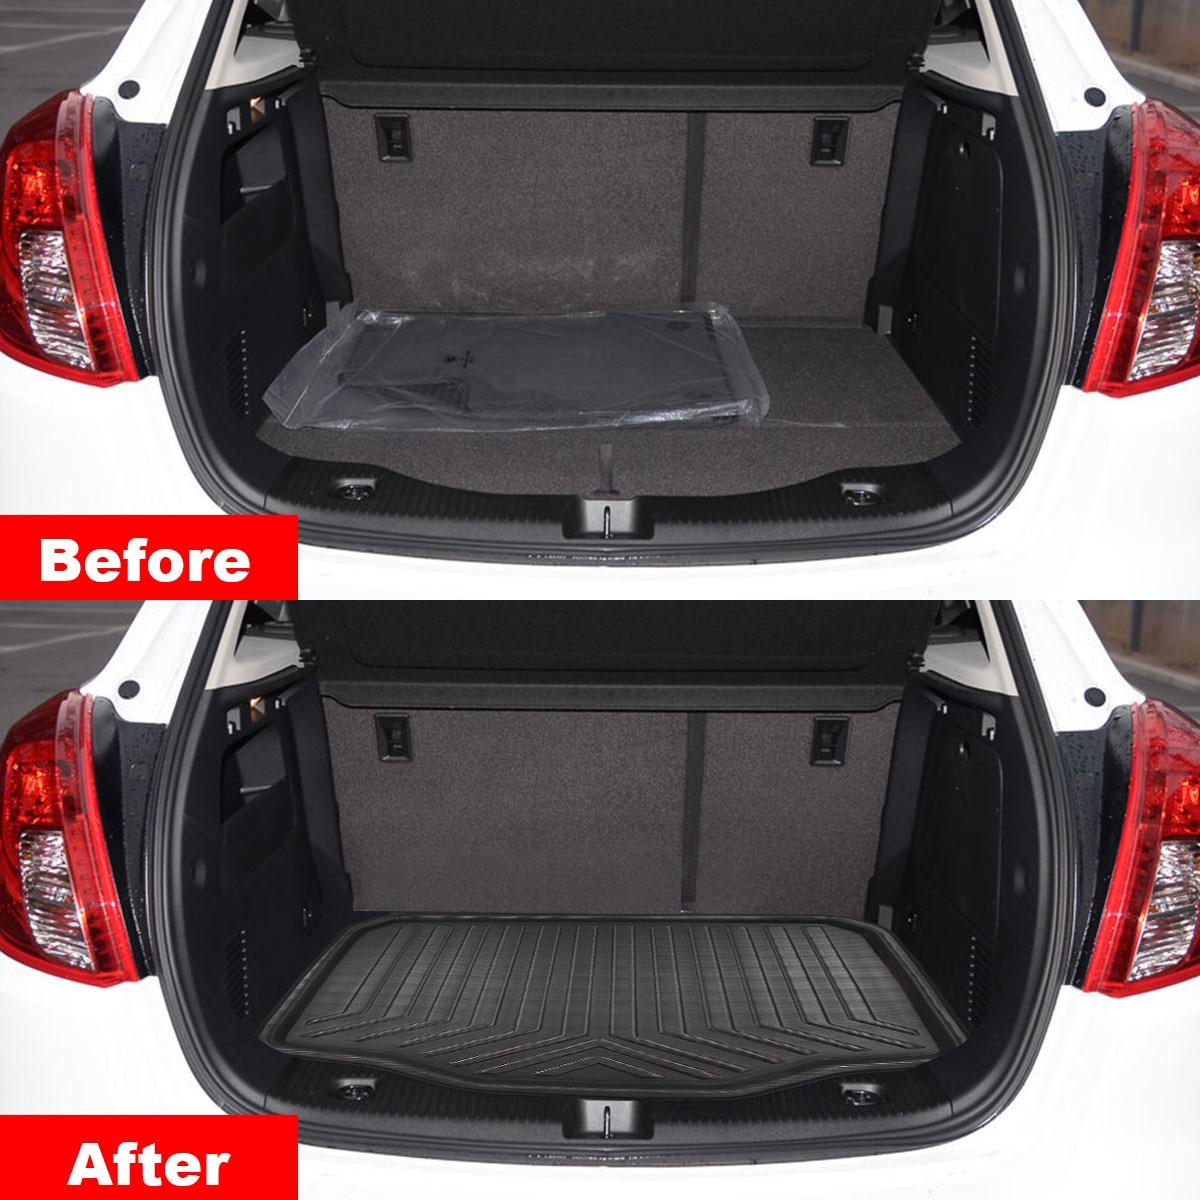 Car Cargo Liner Boot Tray Rear Trunk Cover Matt Mat Floor Carpet Kick Pad For BuickEncore For Opel/Vauxhall Mokka 2013-2018